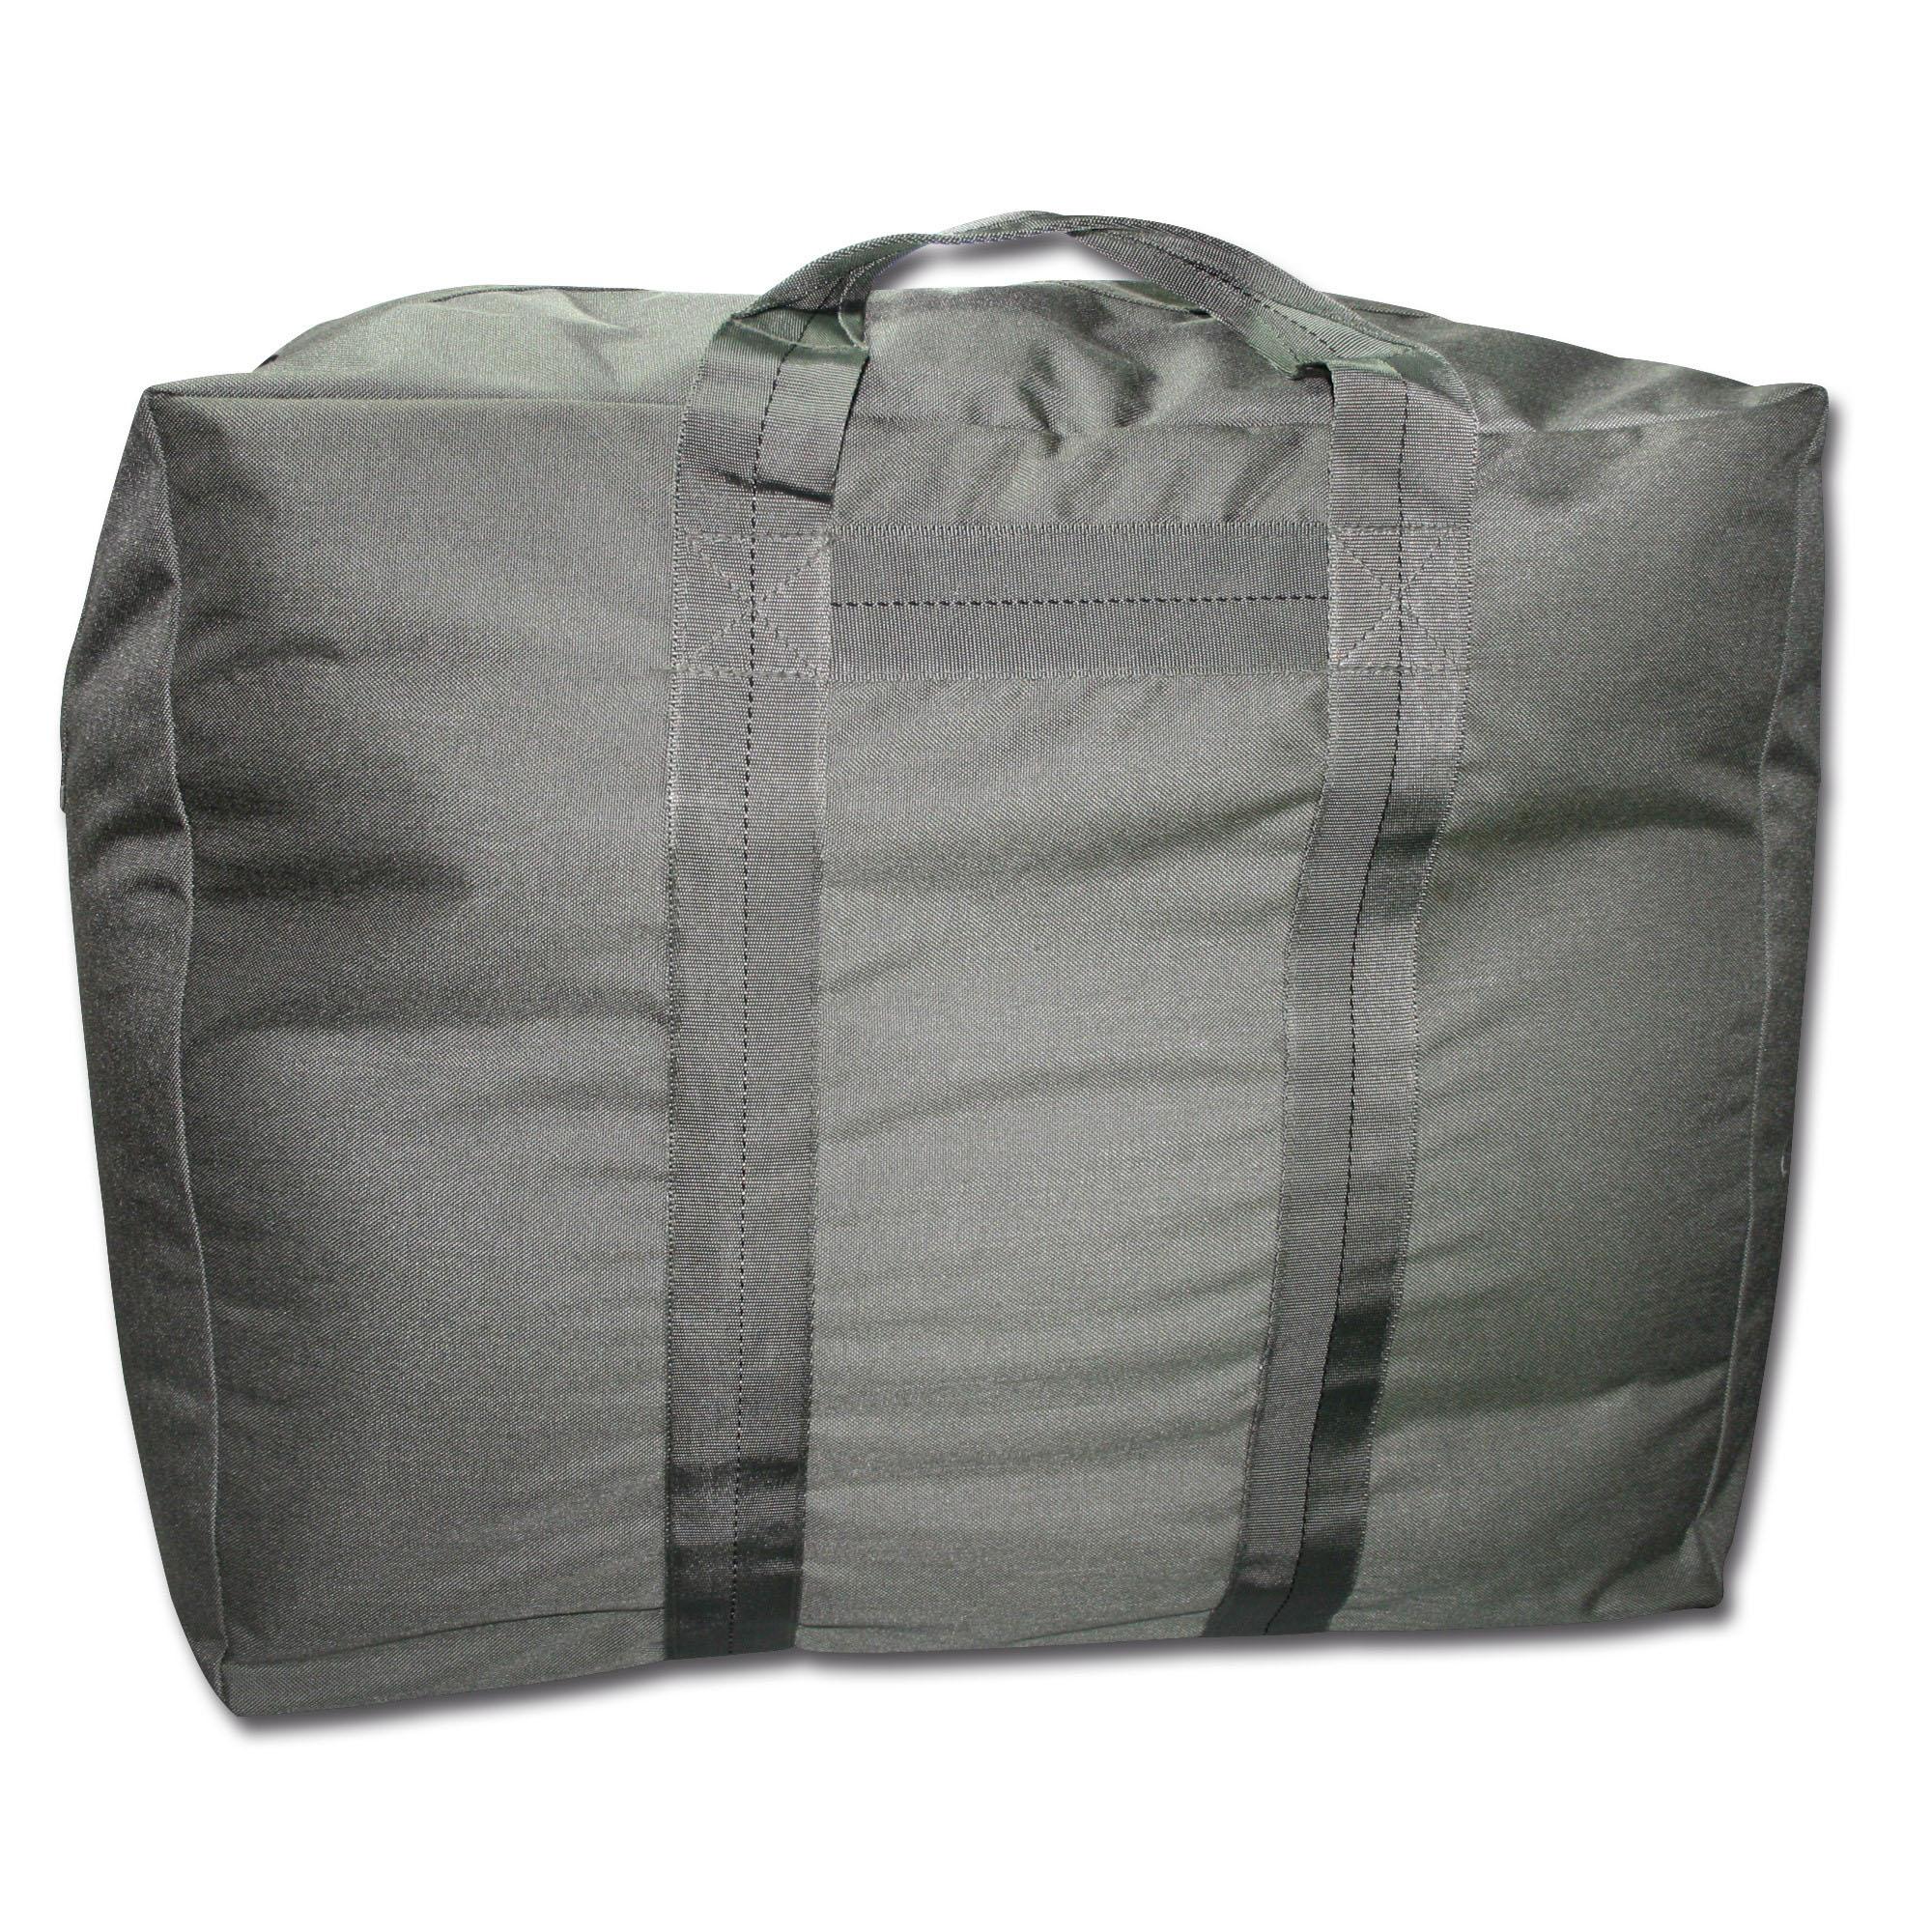 Tasca per kit paracadutista Tru-Spec foliage